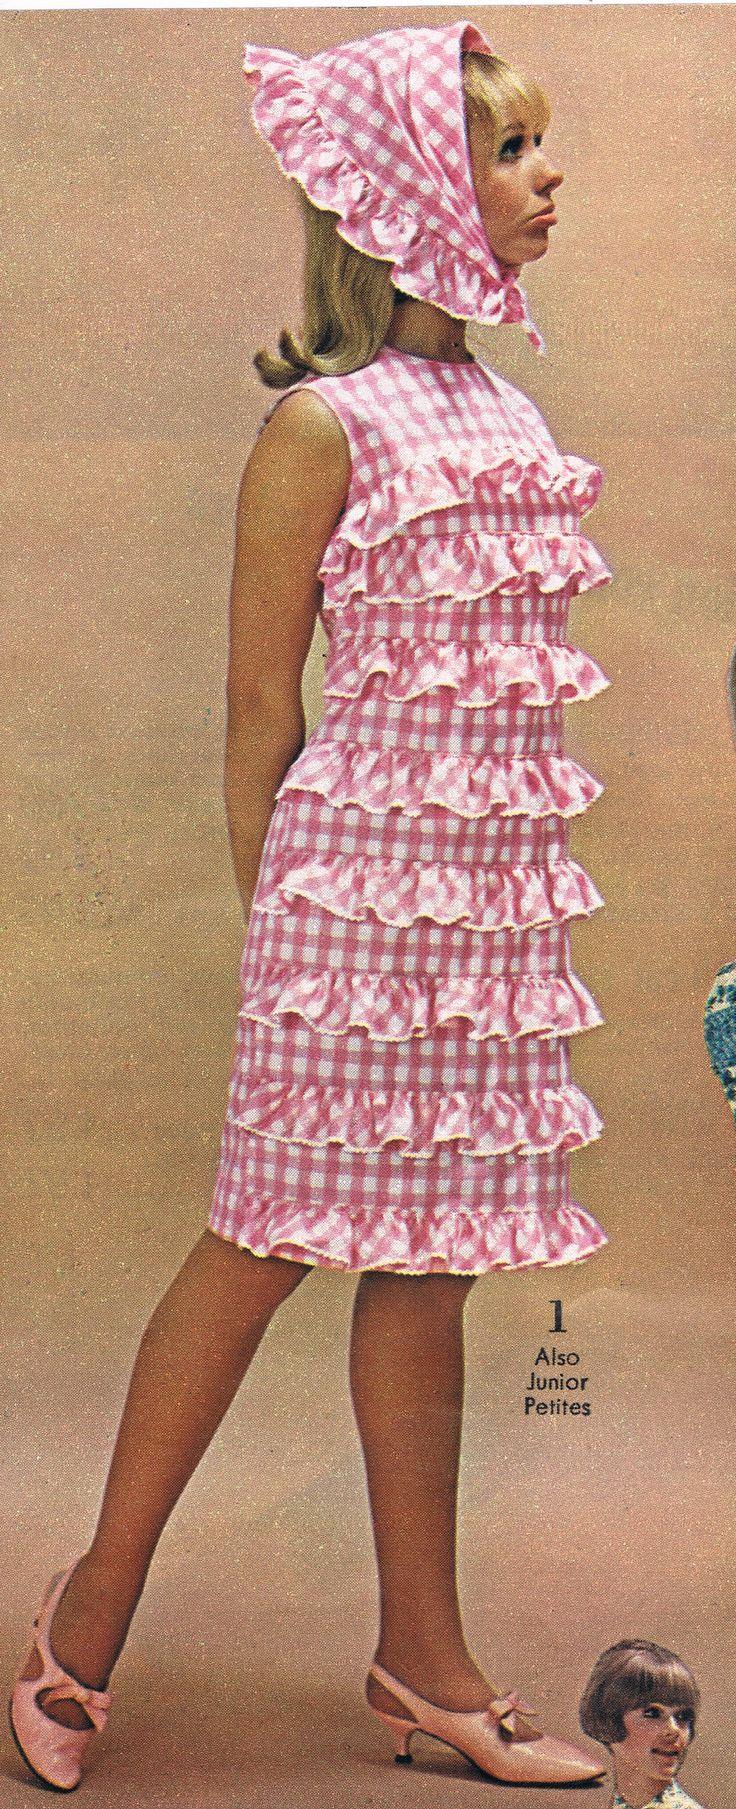 Spiegel catalog 60s checks plaid pink white ruffle dress scarf sheath shift model print ad